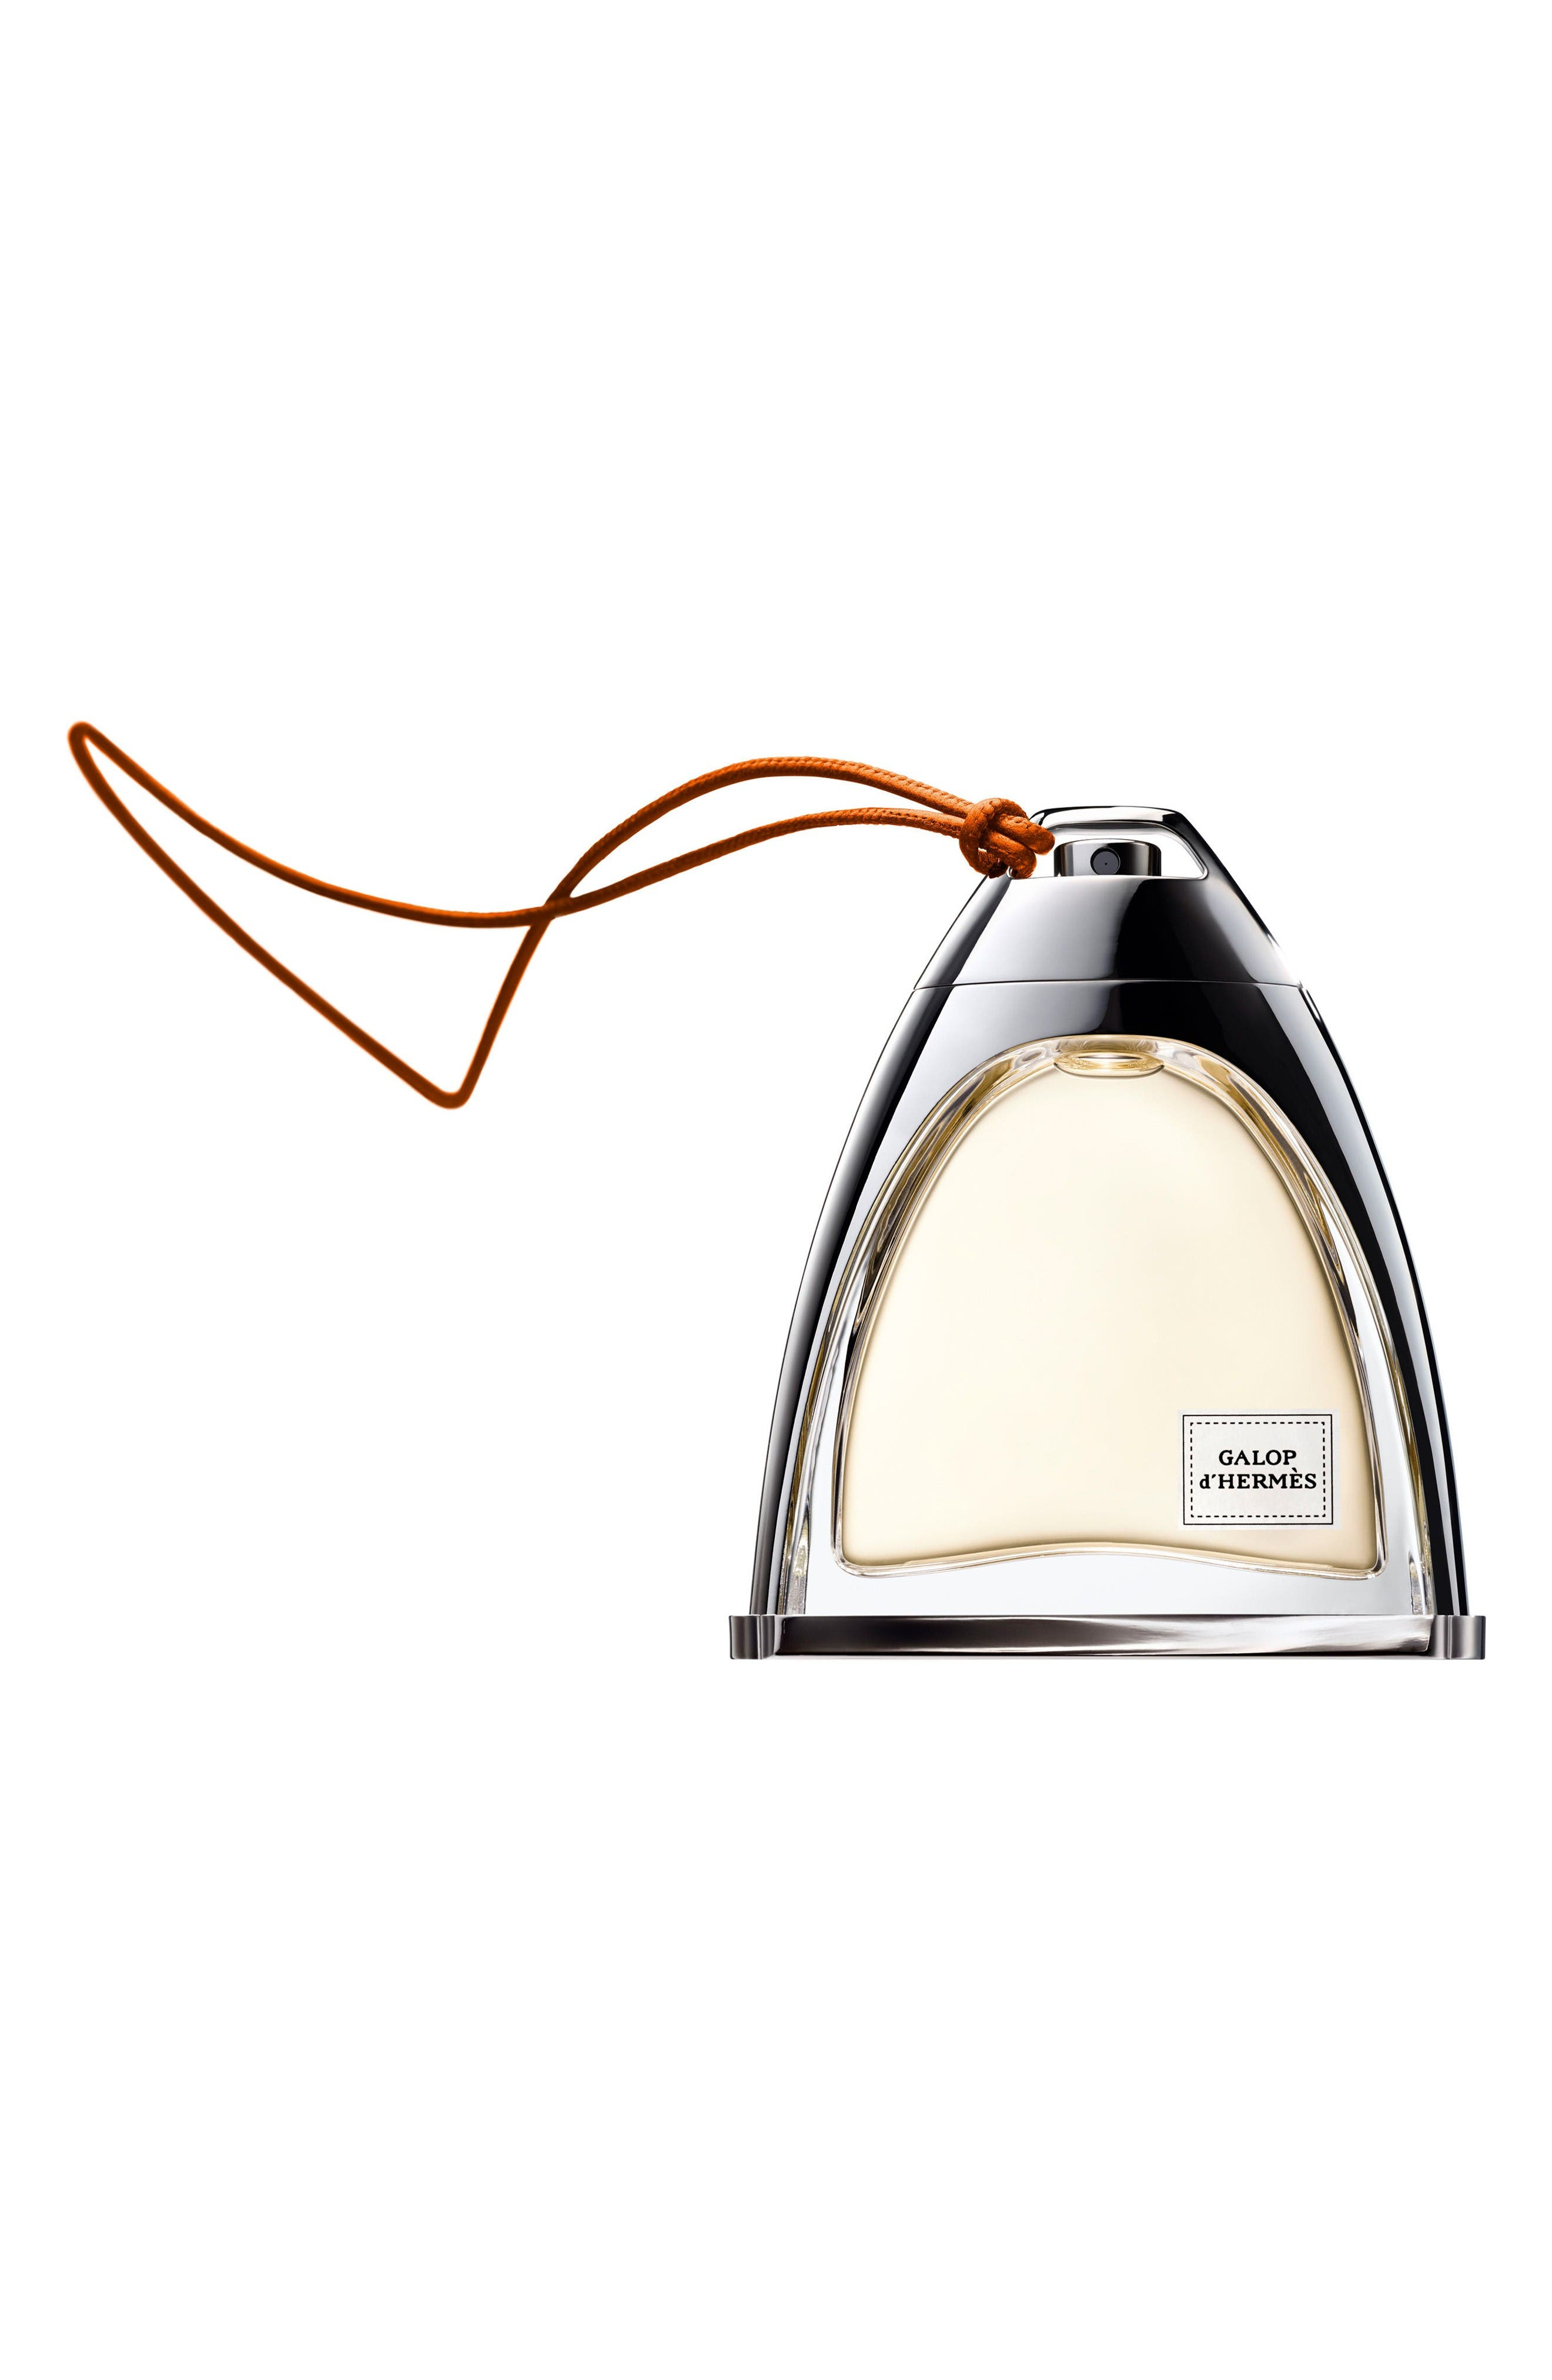 Alternate Image 1 Selected - Hermès Galop d'Hermès - Parfum